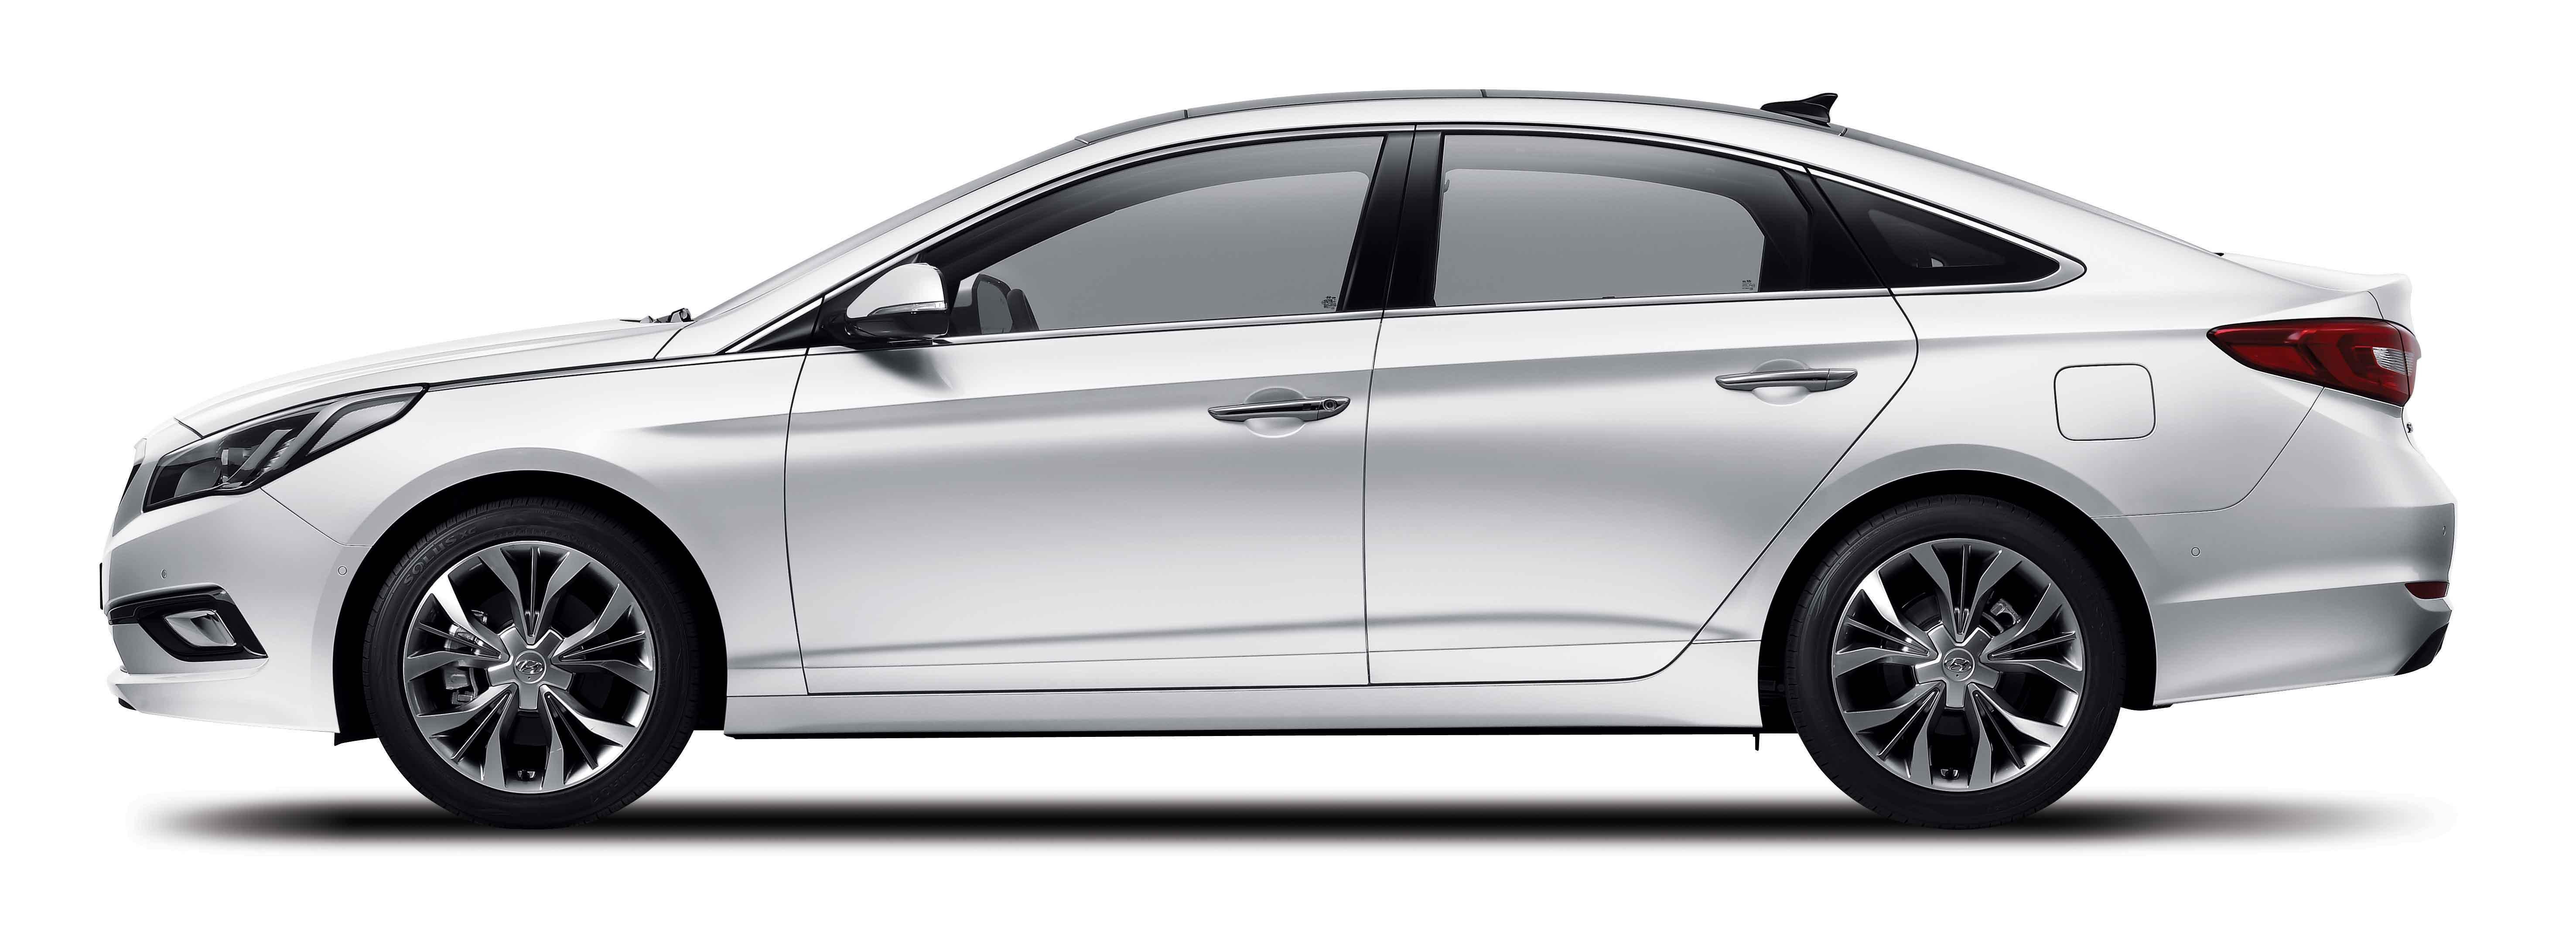 Sonata Side View Autos Ca